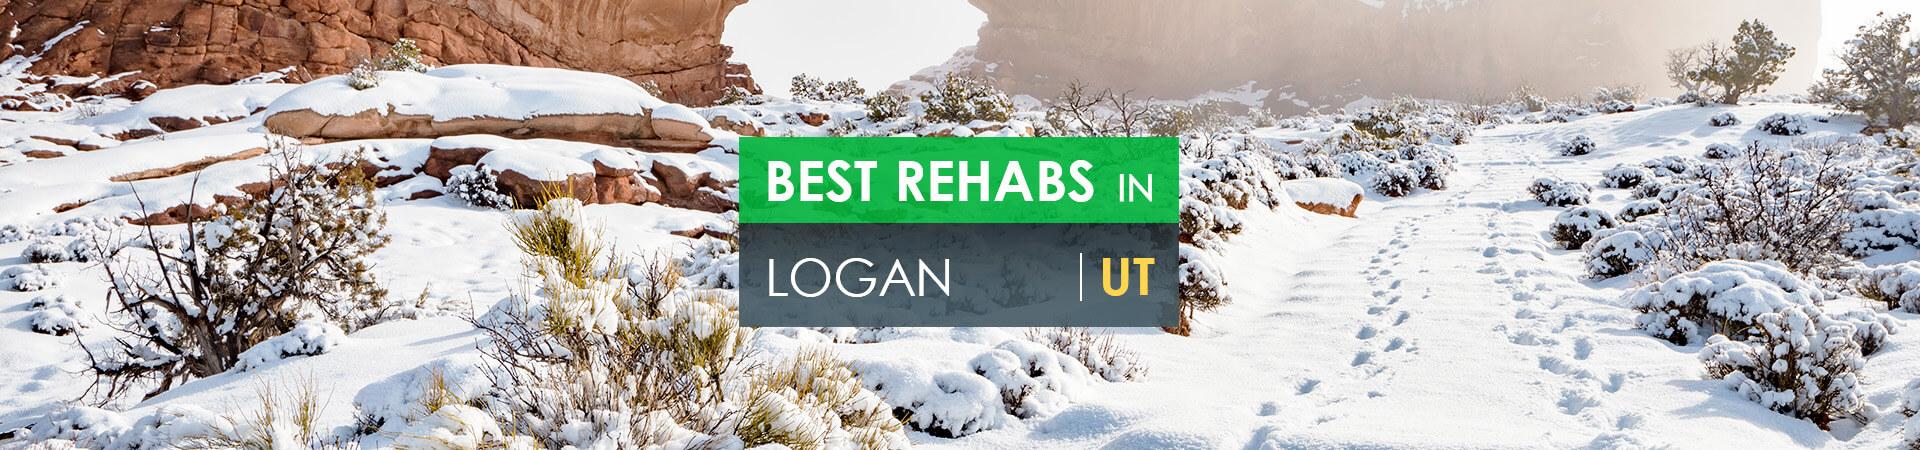 Best rehabs in Logan, UT